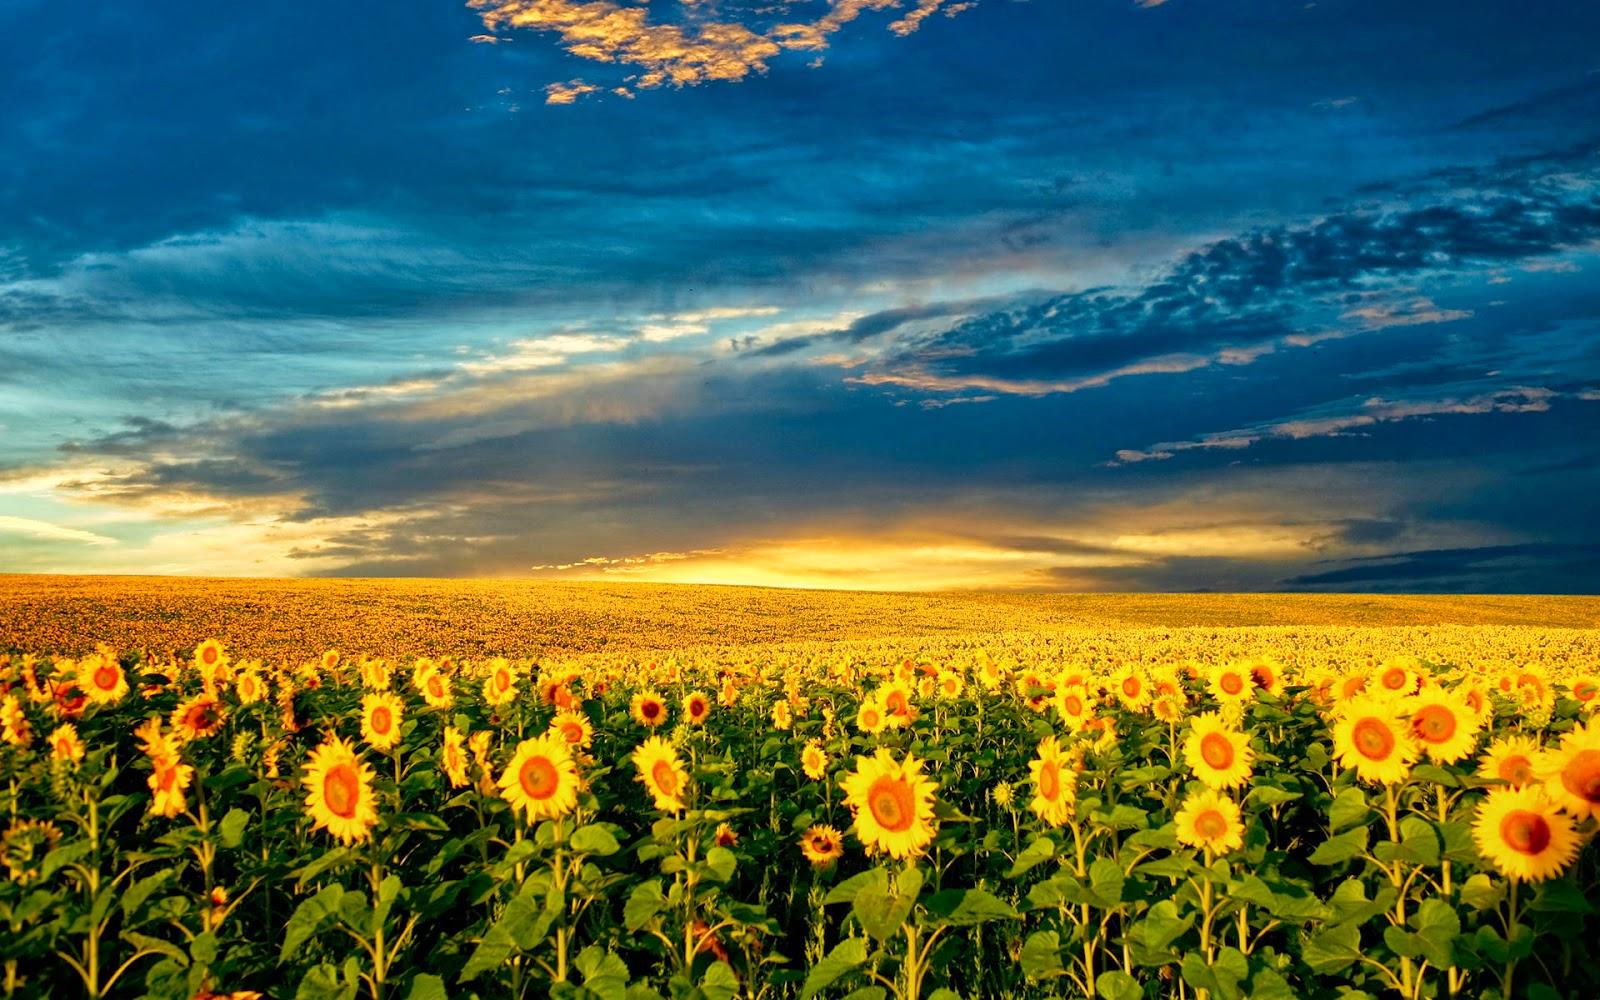 Free Download Wallpapers Free Download Beautiful Sunflower Field Hd Wallpaper